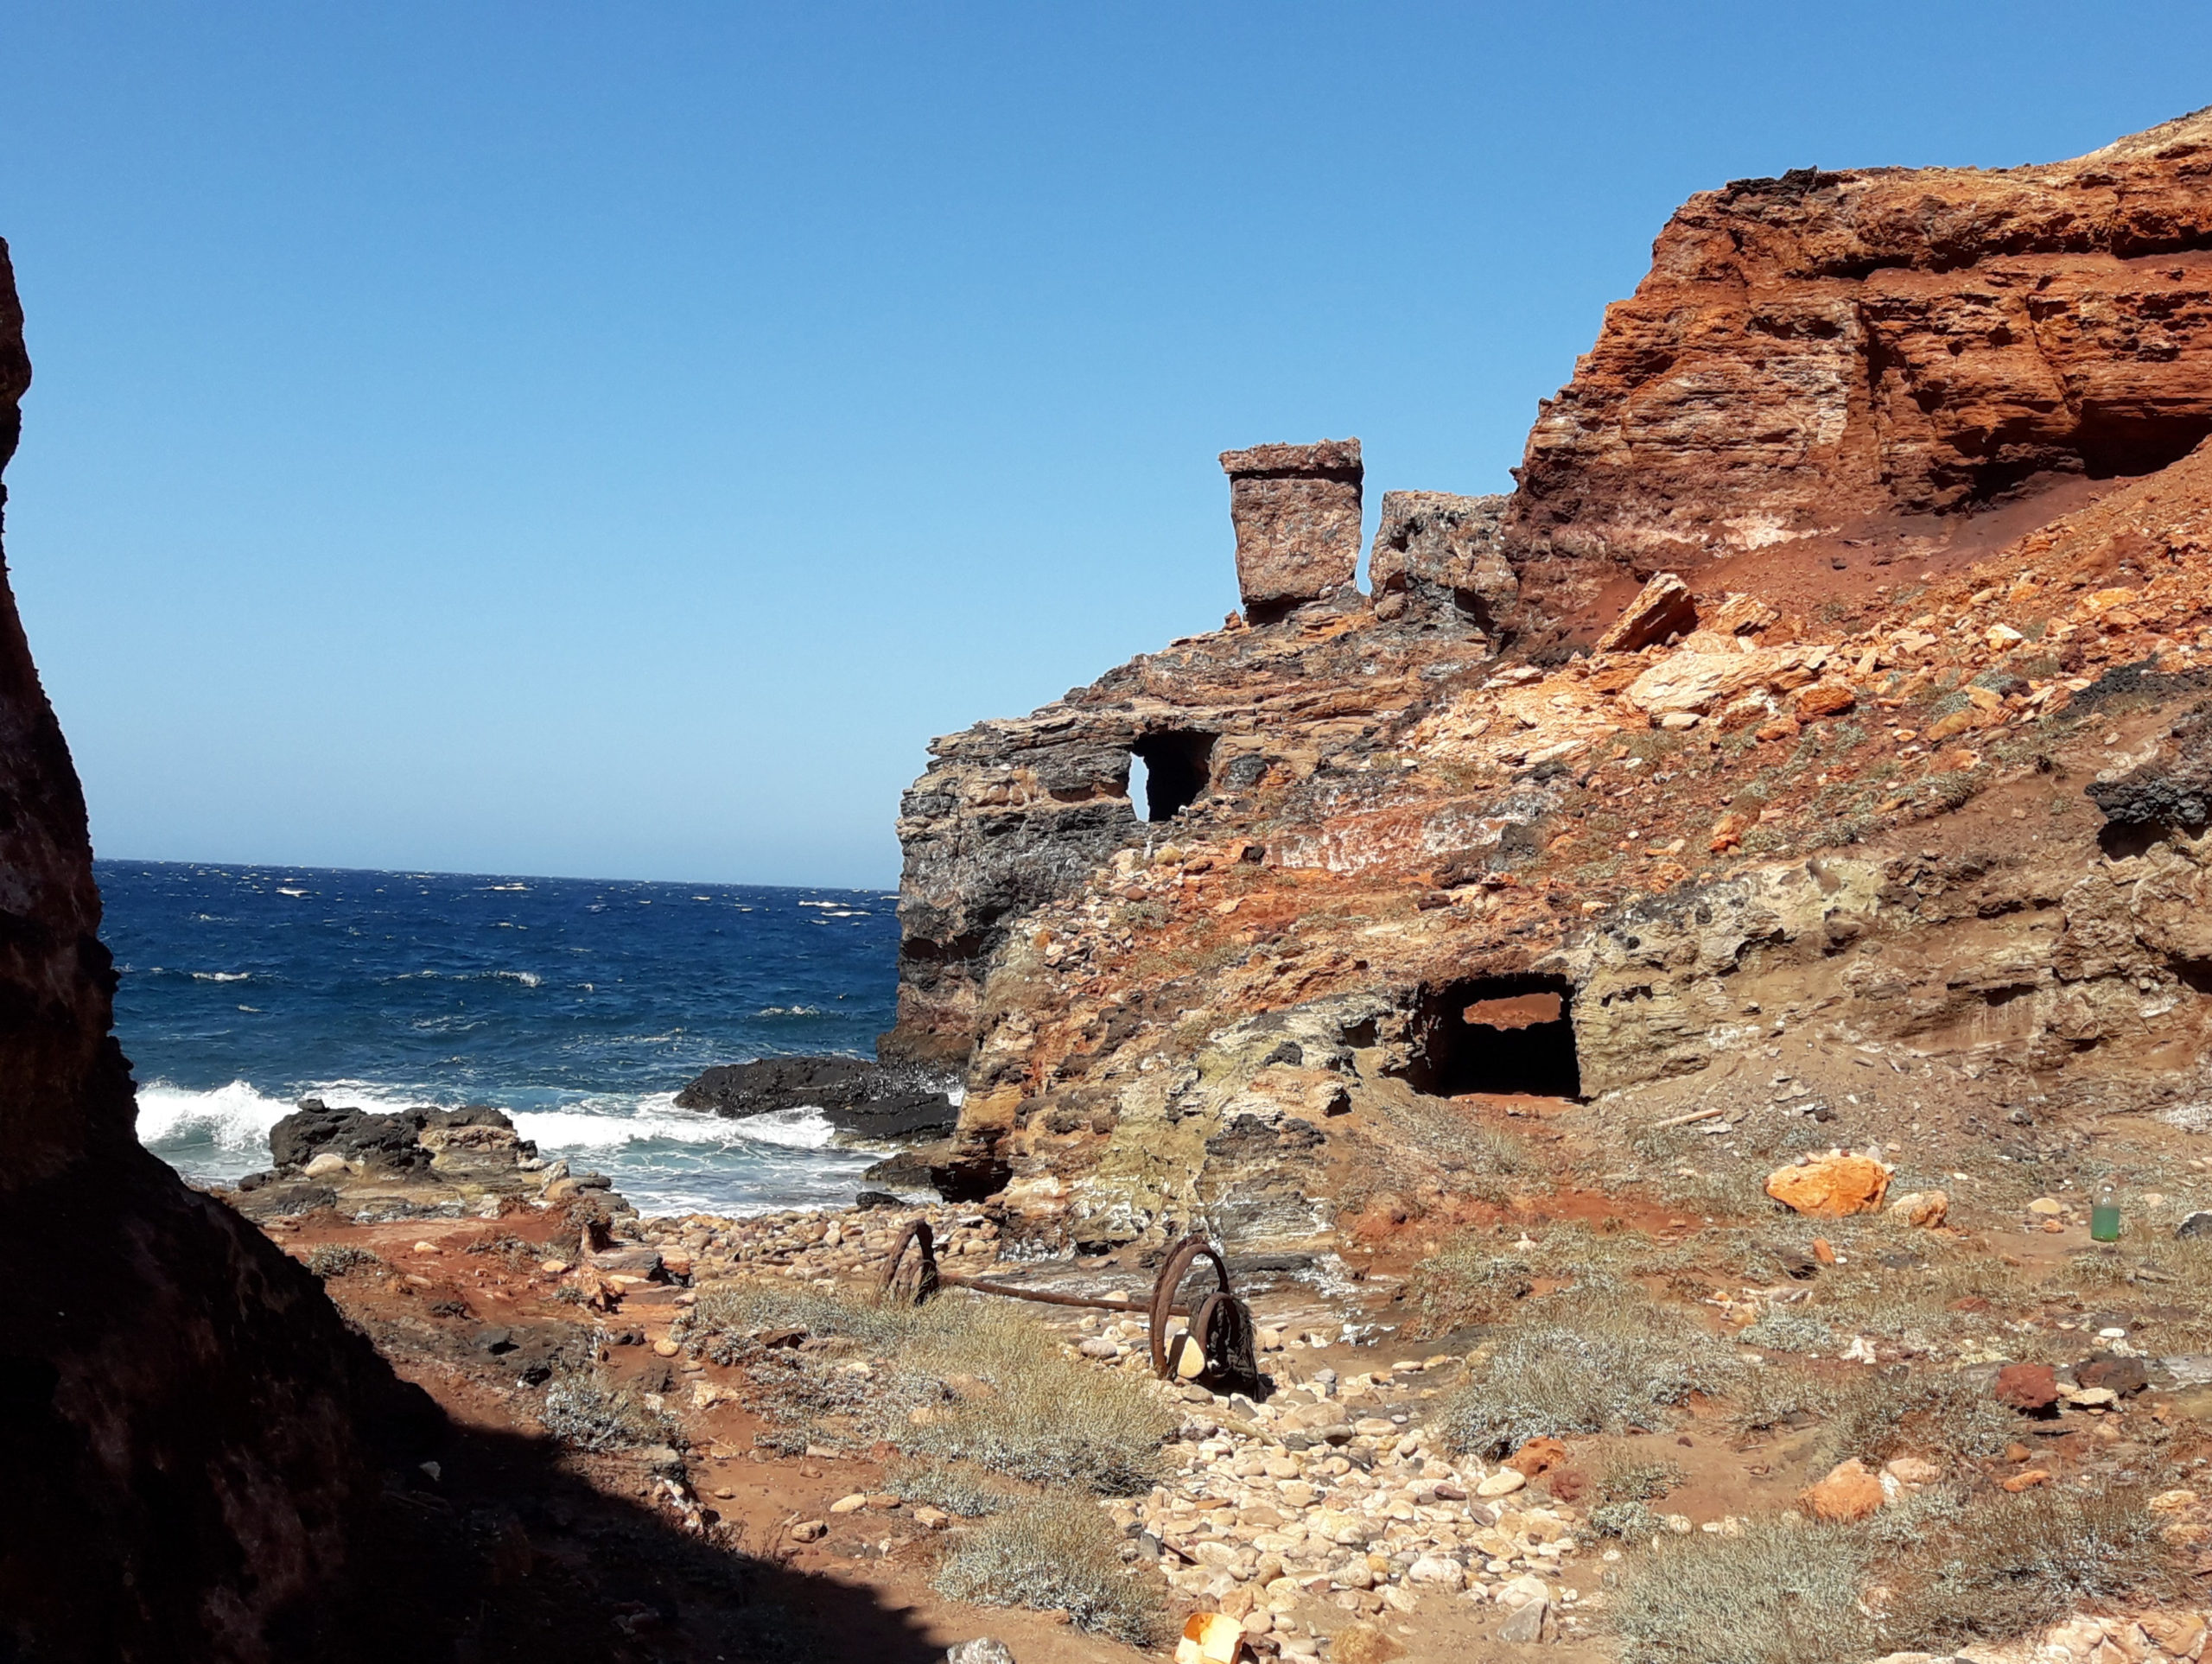 Cape Vani: A Colorful Old Mine